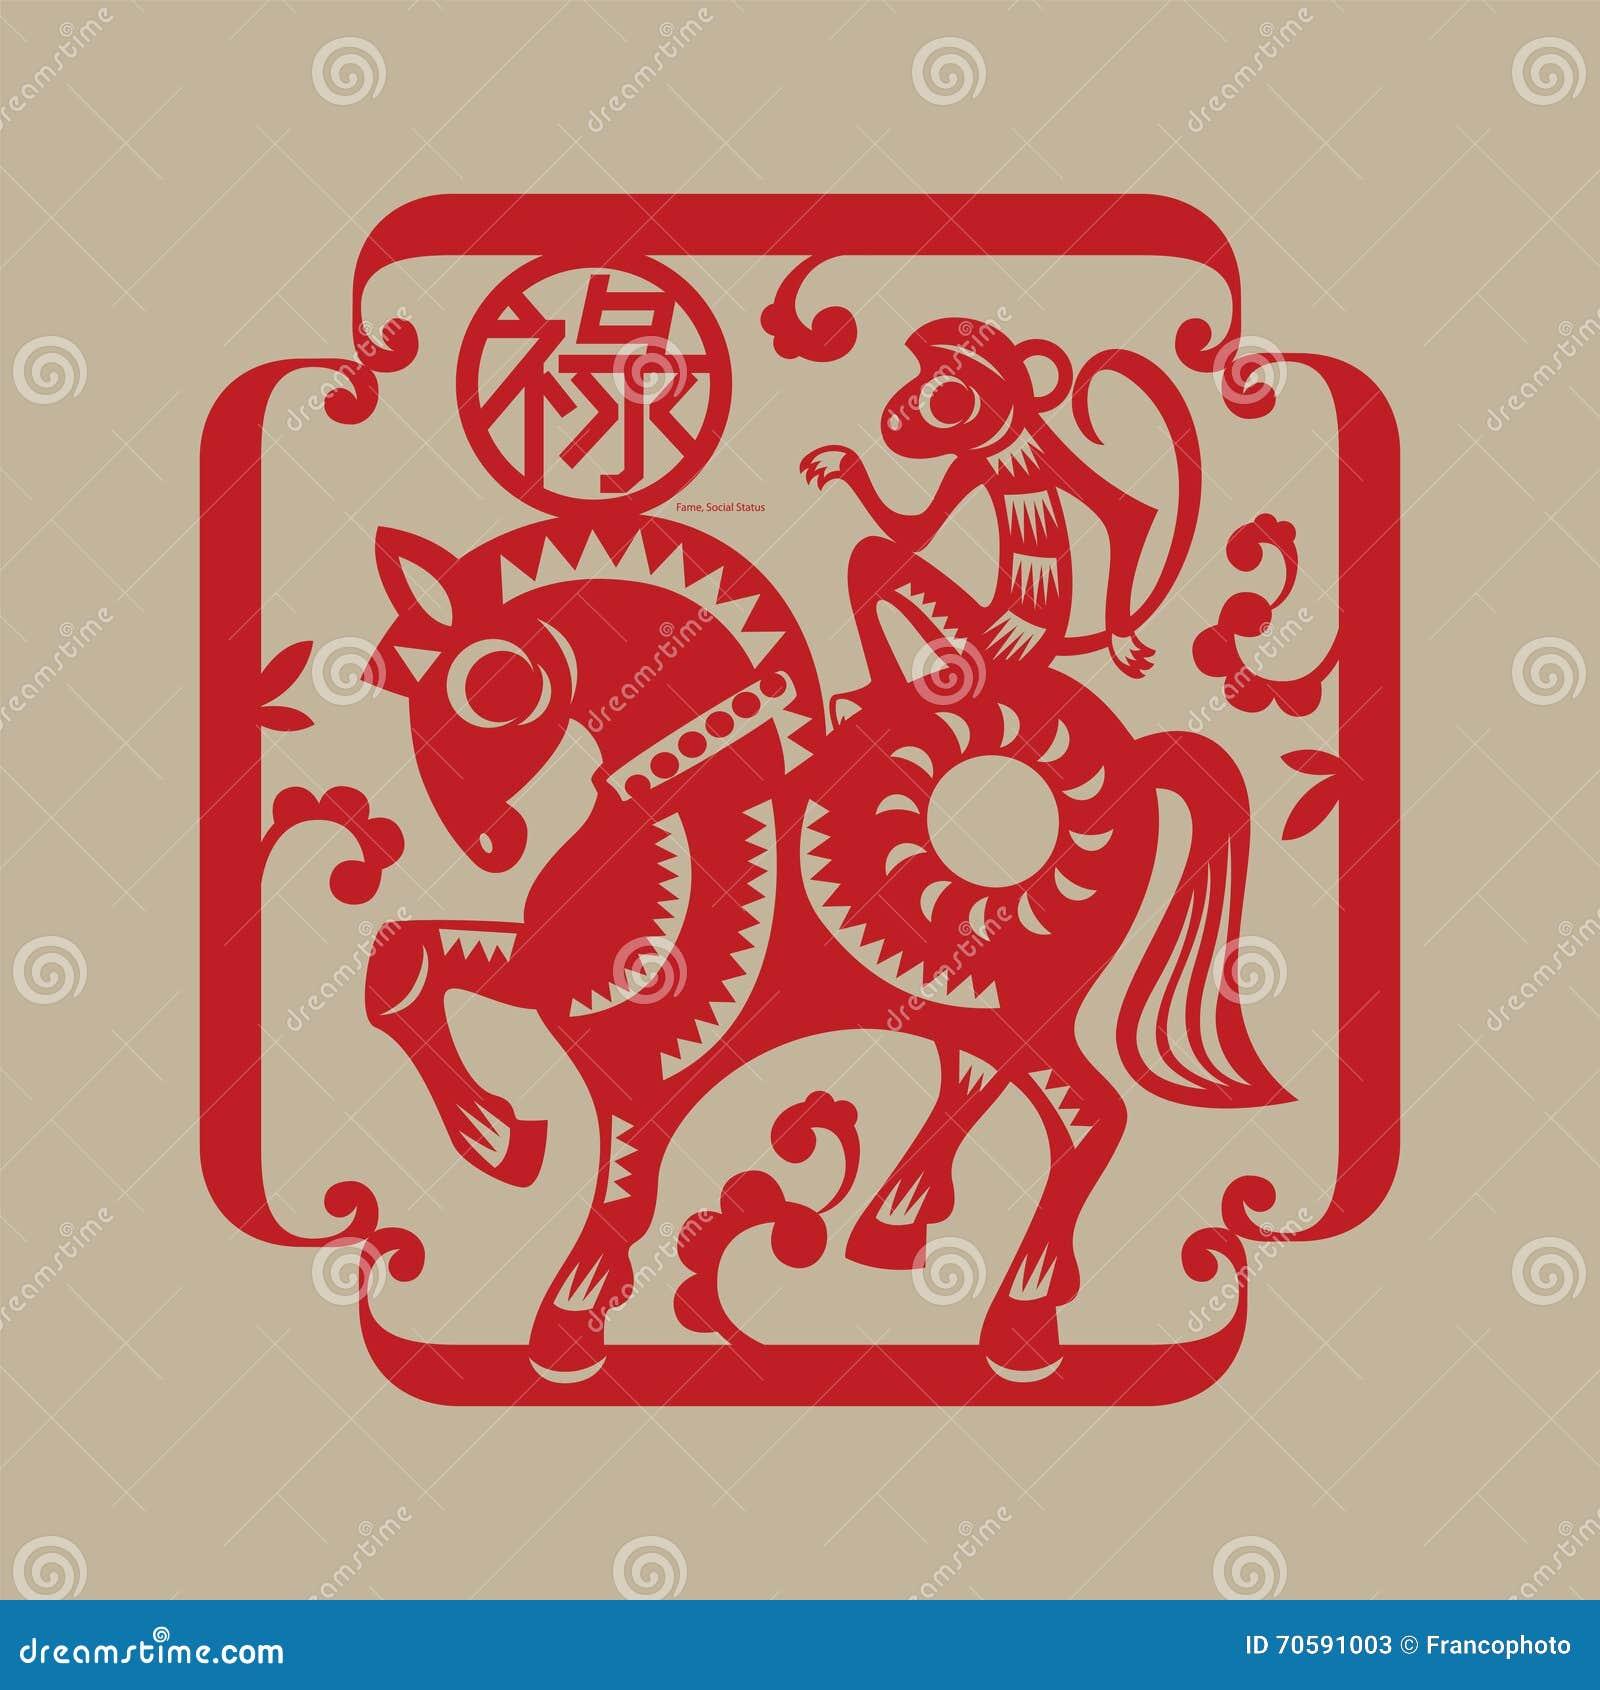 Chinese lucky symbol monkey rides a horse stock vector chinese lucky symbol monkey rides a horse buycottarizona